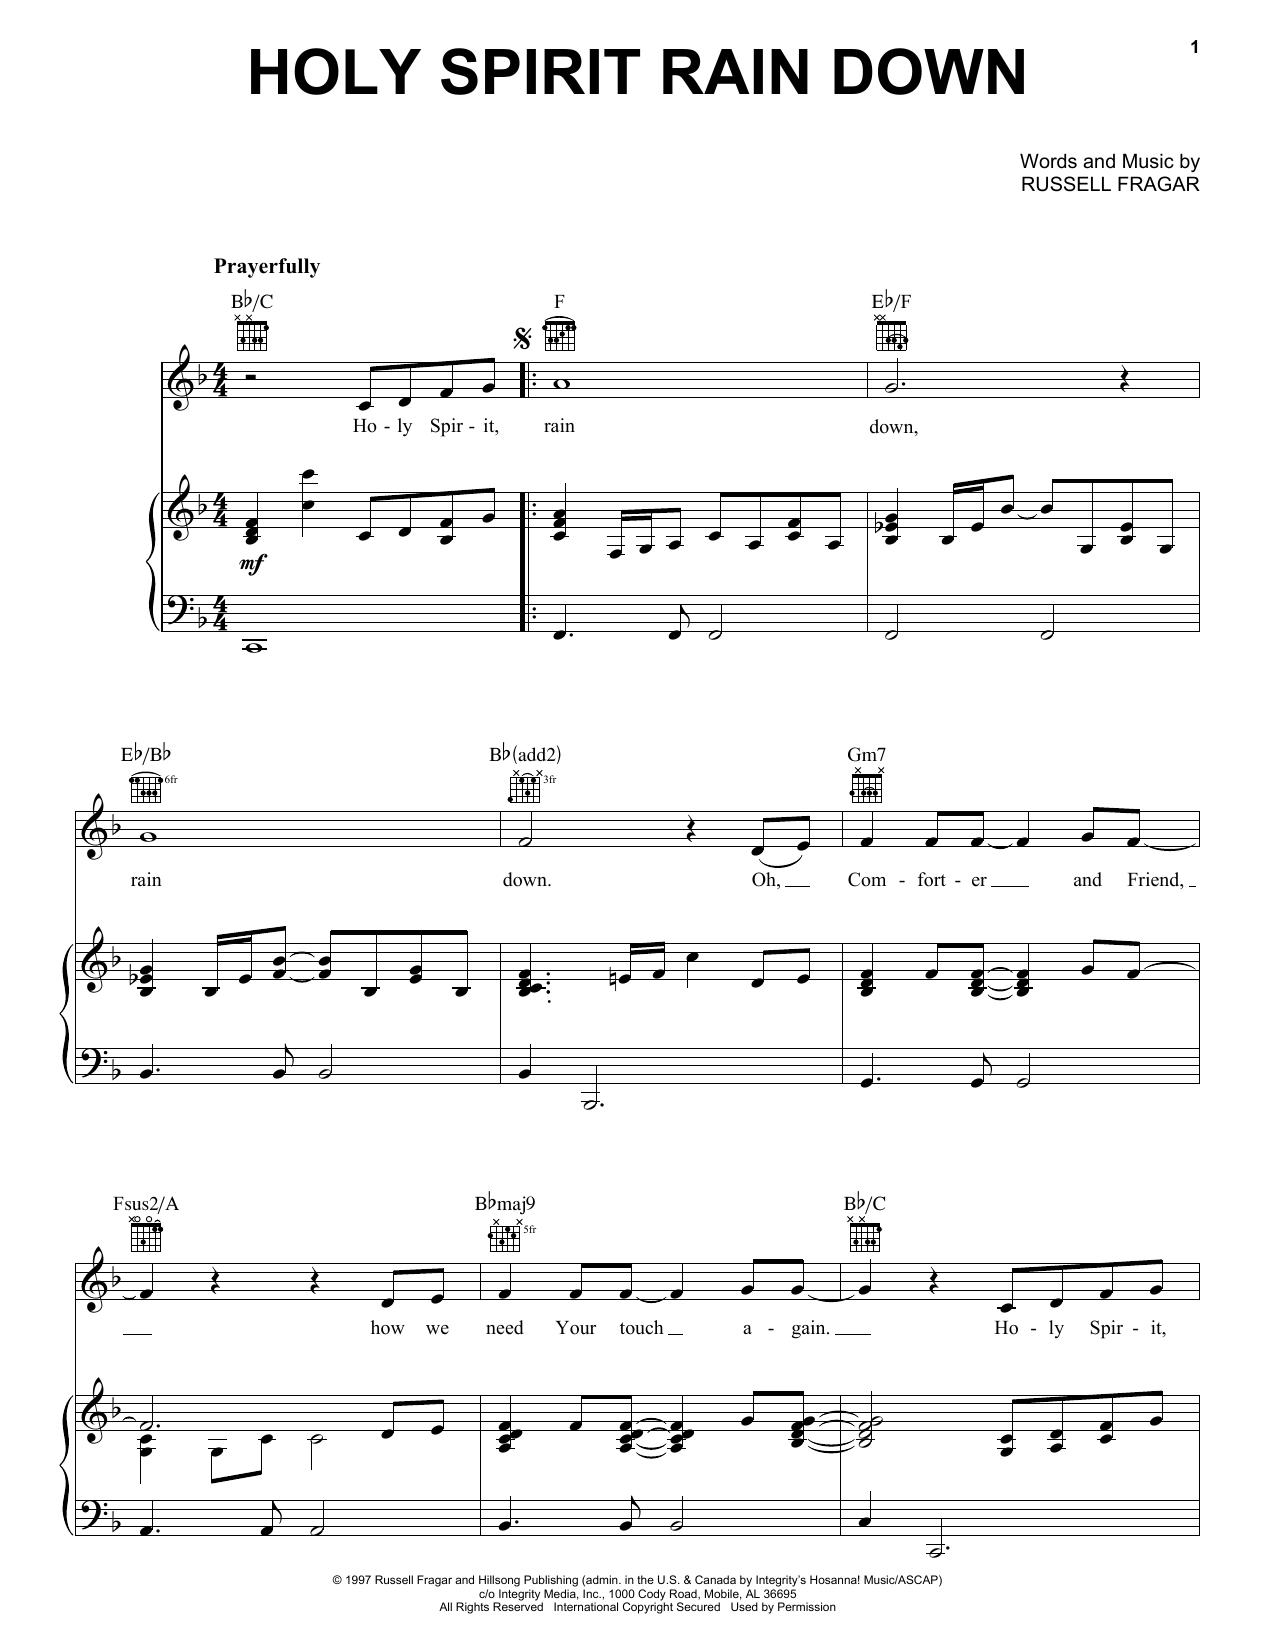 Russell Fragar Holy Spirit Rain Down sheet music notes printable PDF score